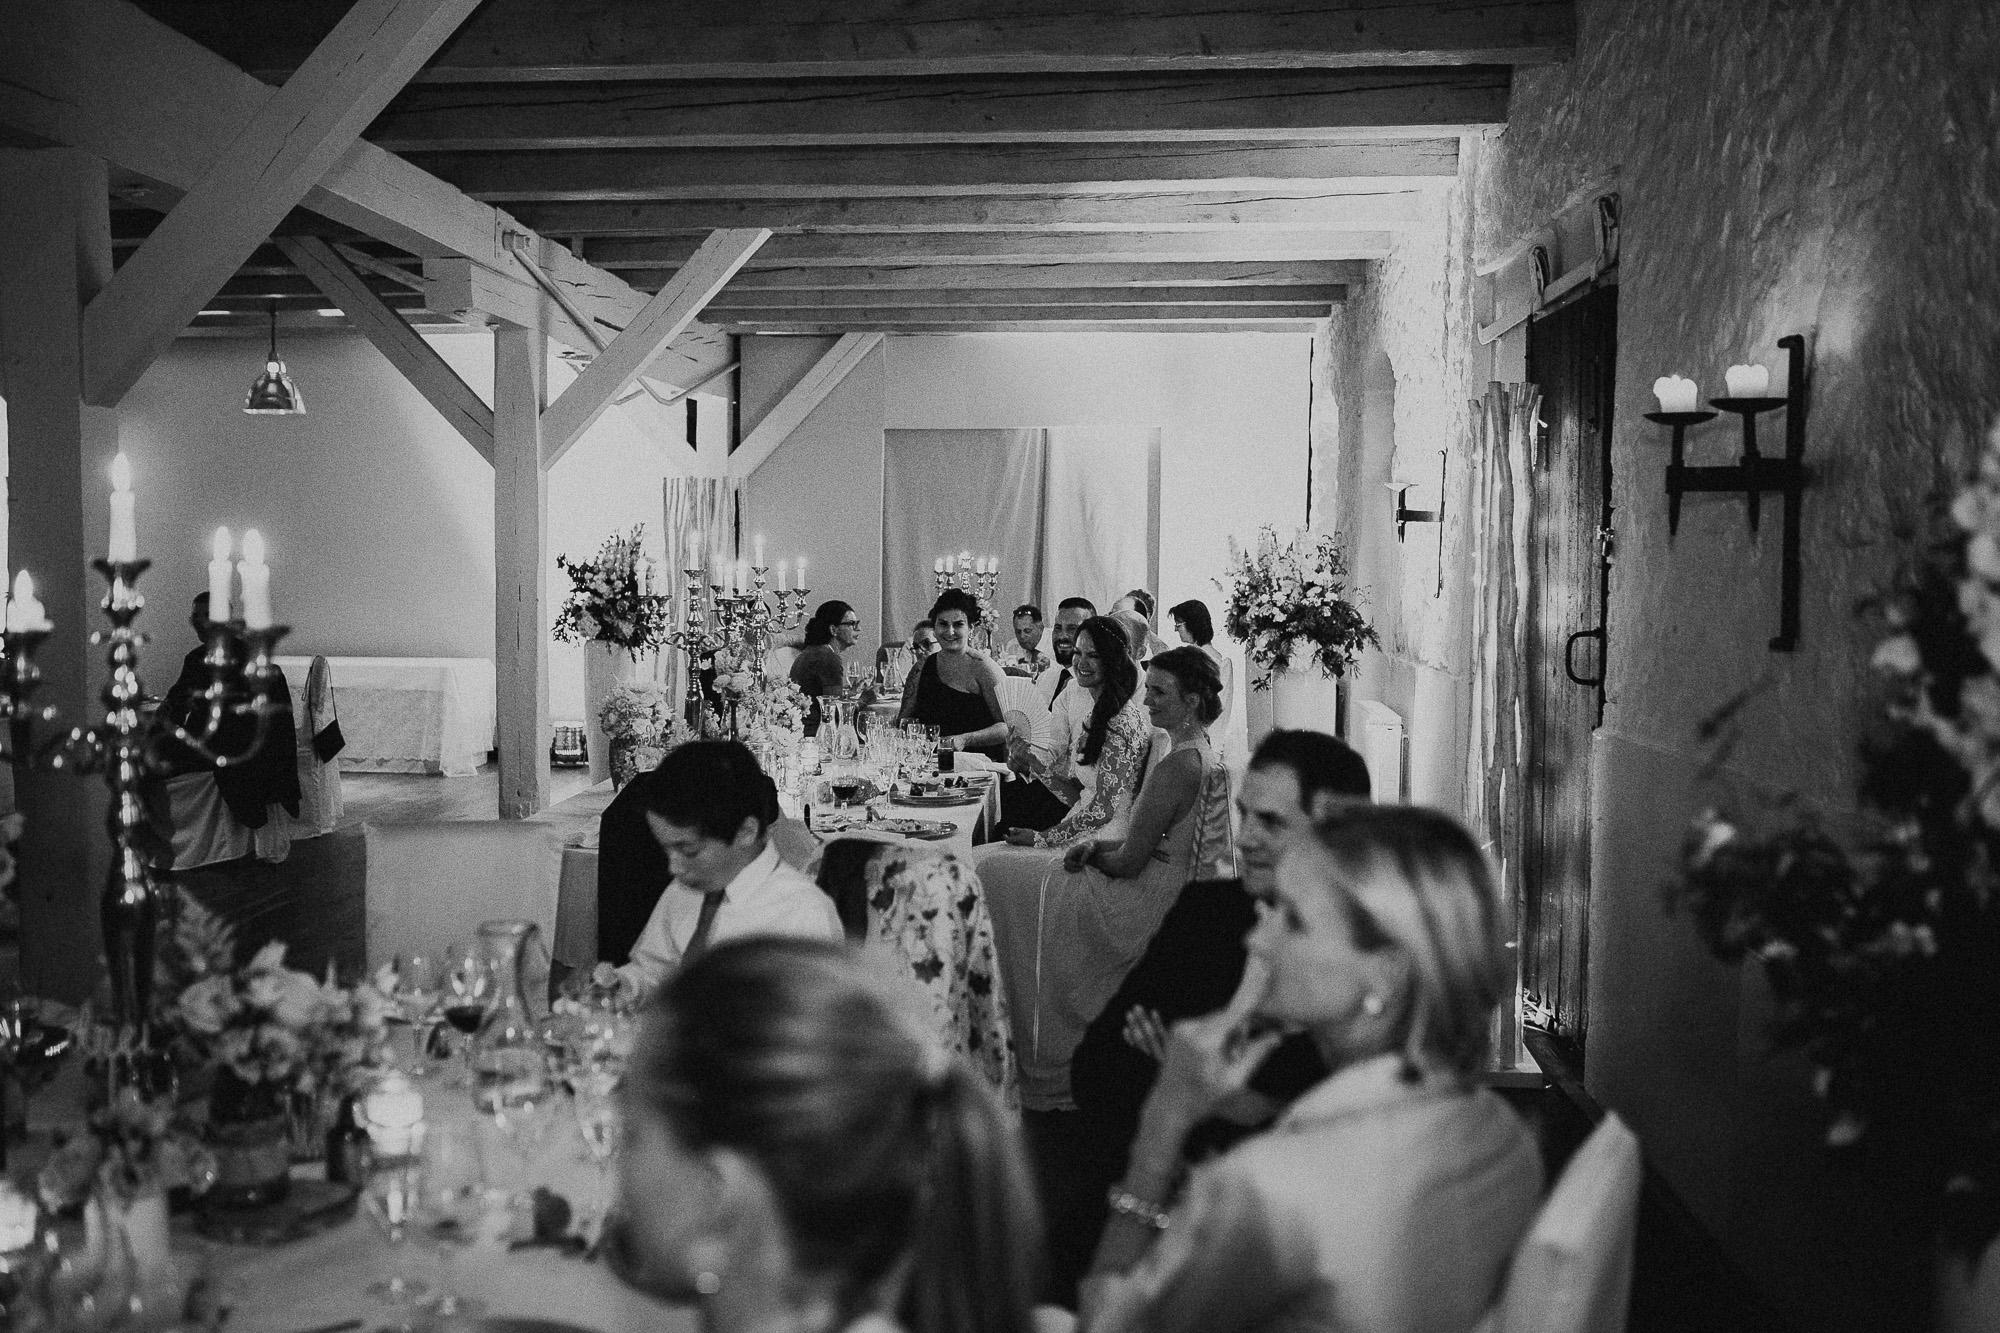 DanielaMarquardtPhotography_Hochzeitsfotograf_Düsseldorf_Köln_Mallorca_Bayern_Austria_Harz_Wedding_AileenundLennart_Weddingphotographer_Ibiza_Tuskany_Italien_Toskana_Portugal_Lissabon257